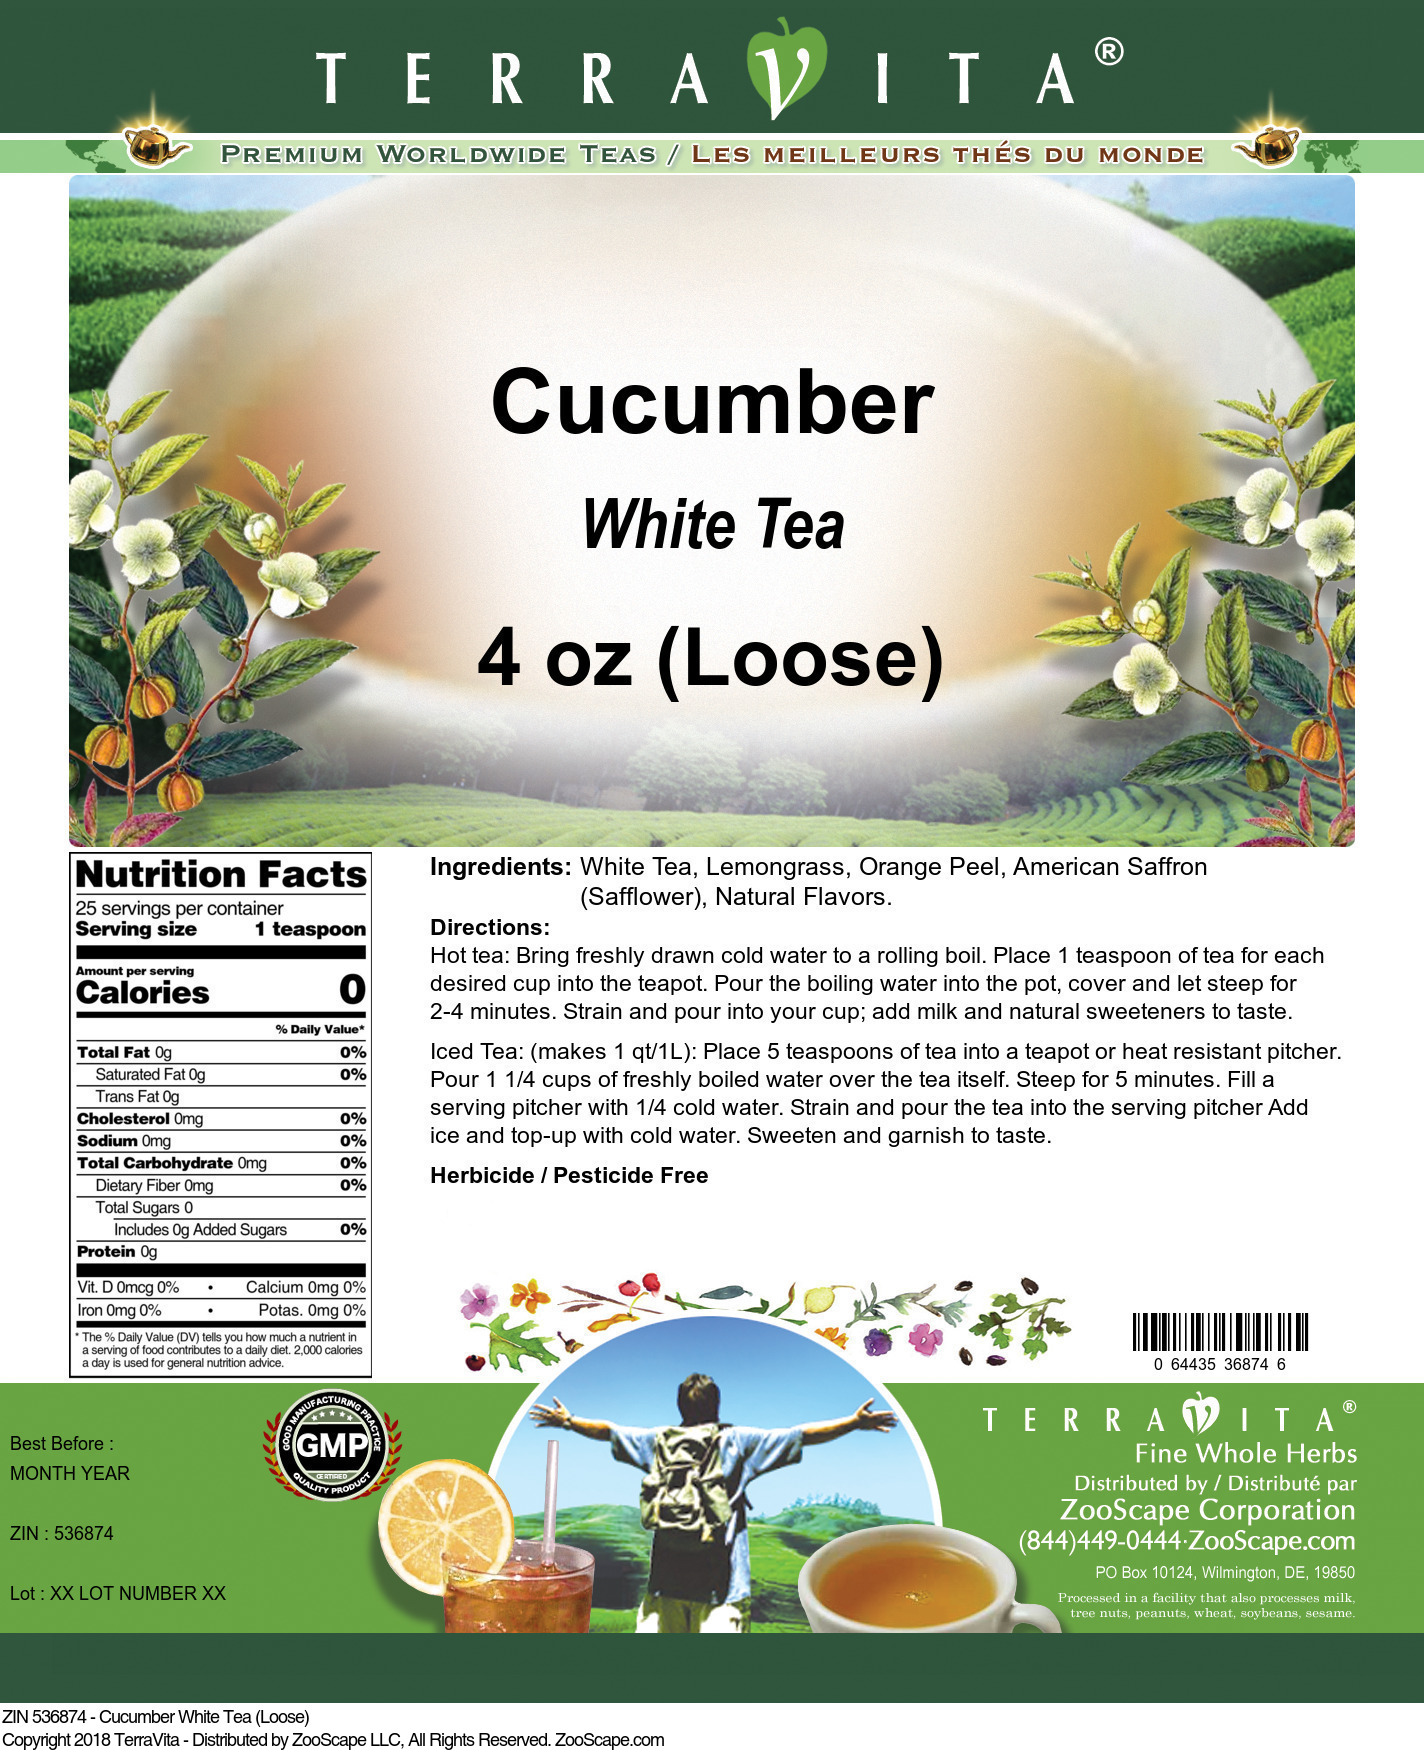 Cucumber White Tea